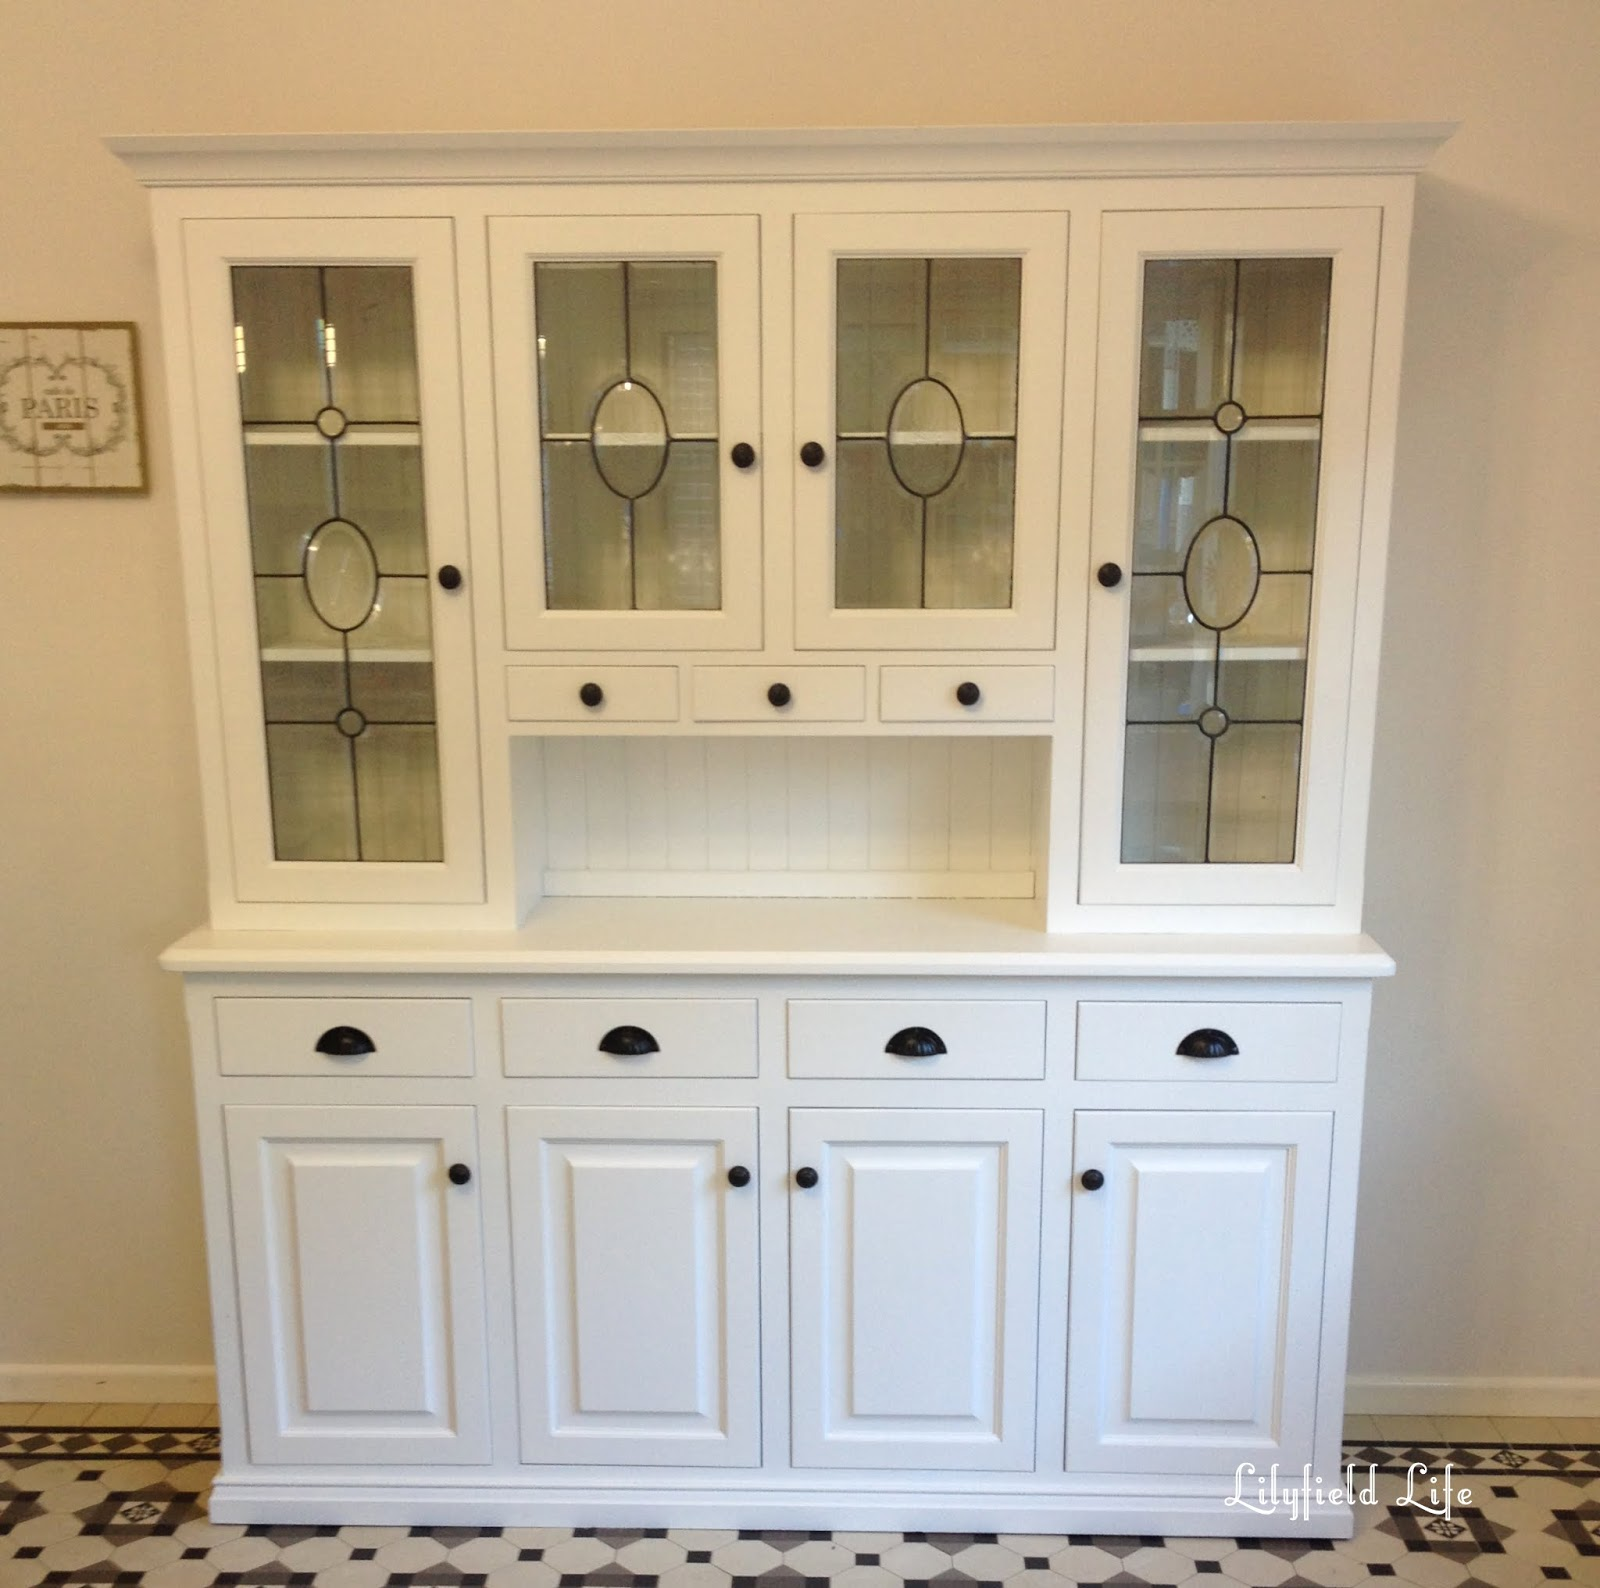 Kitchen cabinet white lacquered kitchen cabinet DKRVRGI